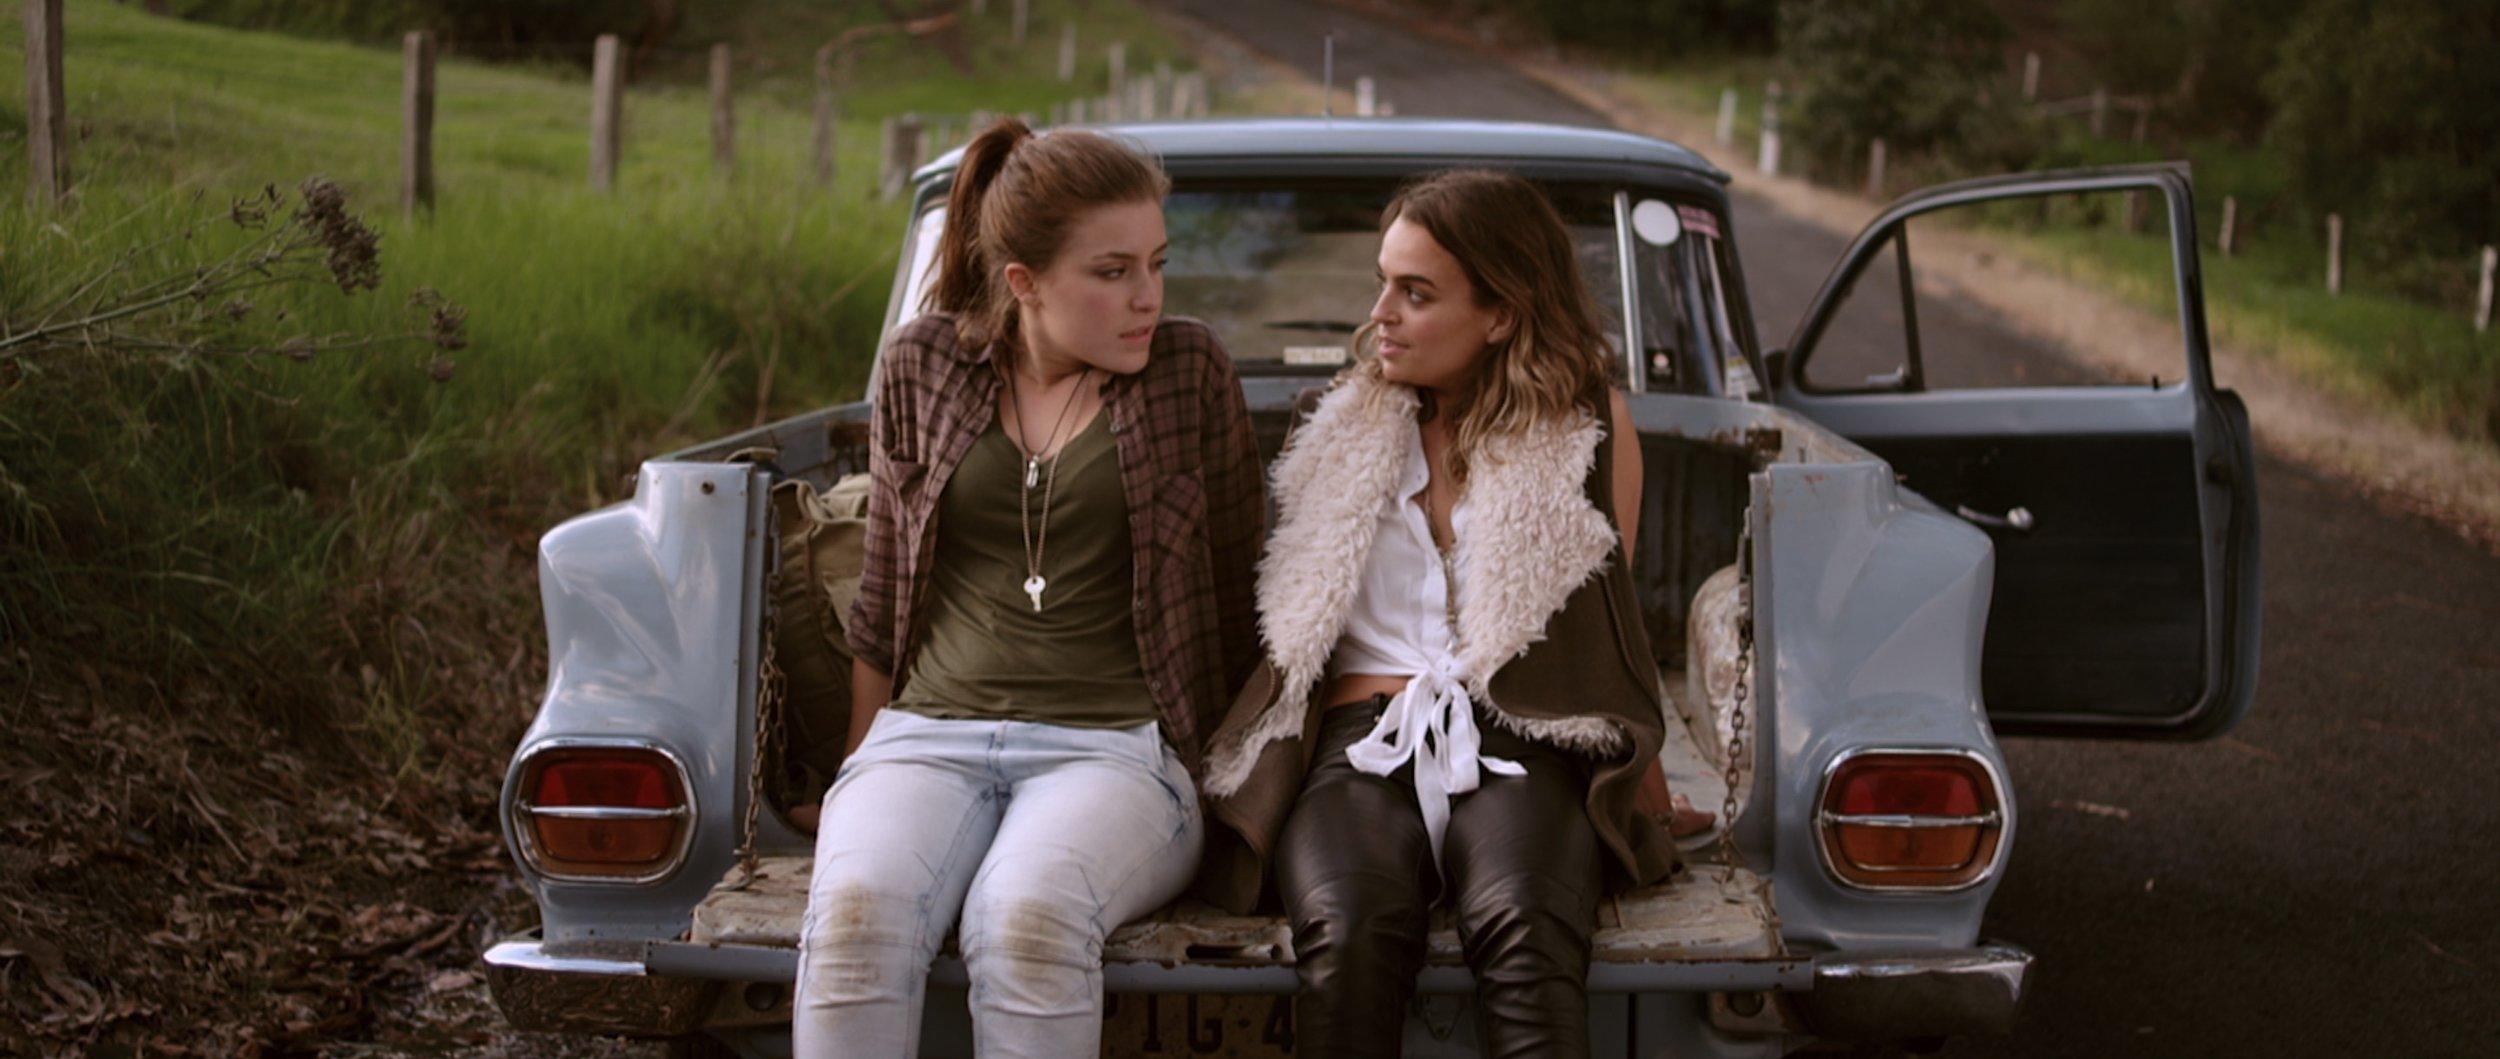 Kate Halpin Director Film - A Private Matter - Bianca Bradey 6